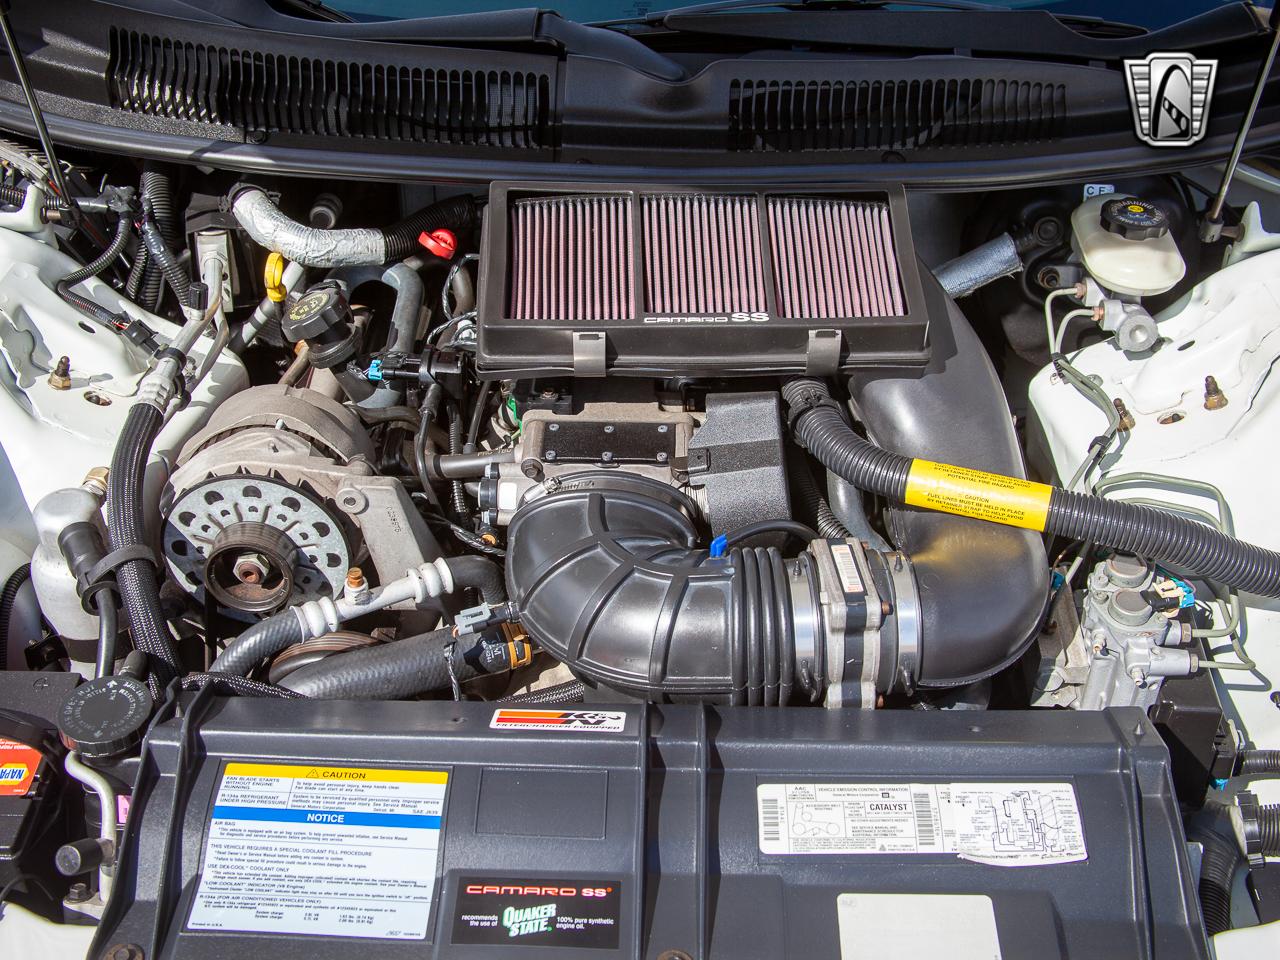 1997 Chevrolet Camaro 6